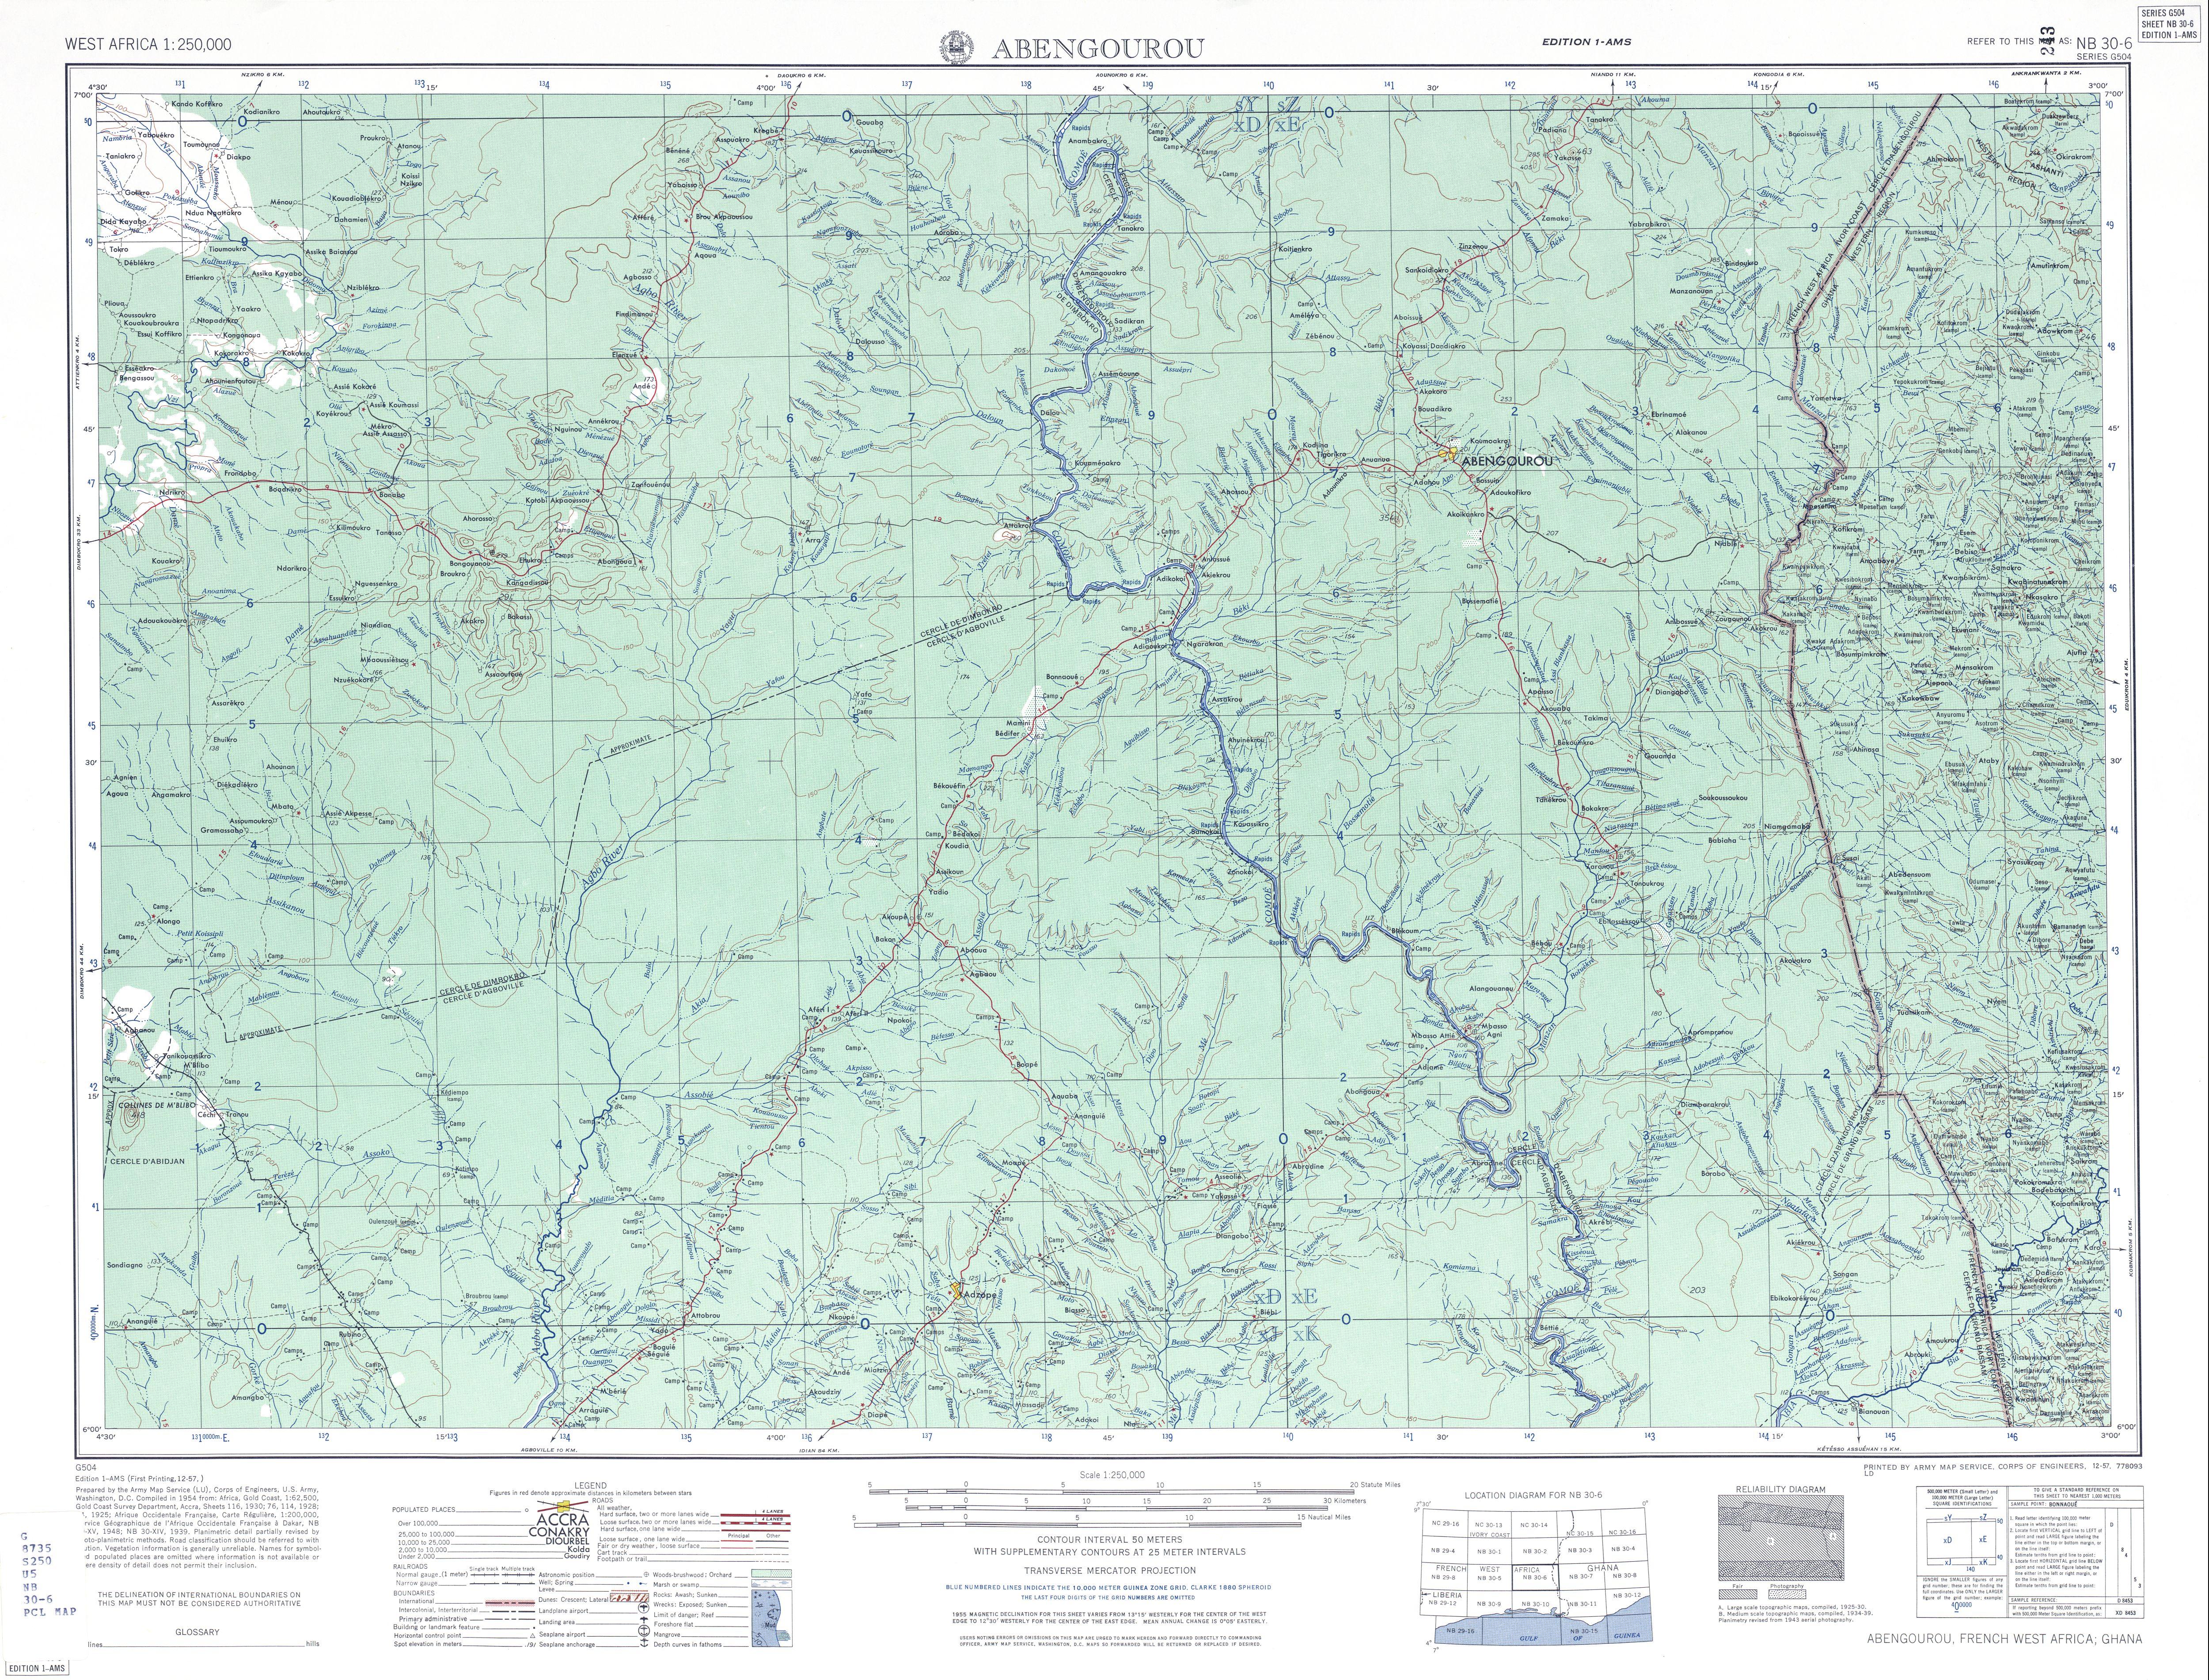 Hoja Abengourou del Mapa Topográfico de África Occidental 1955